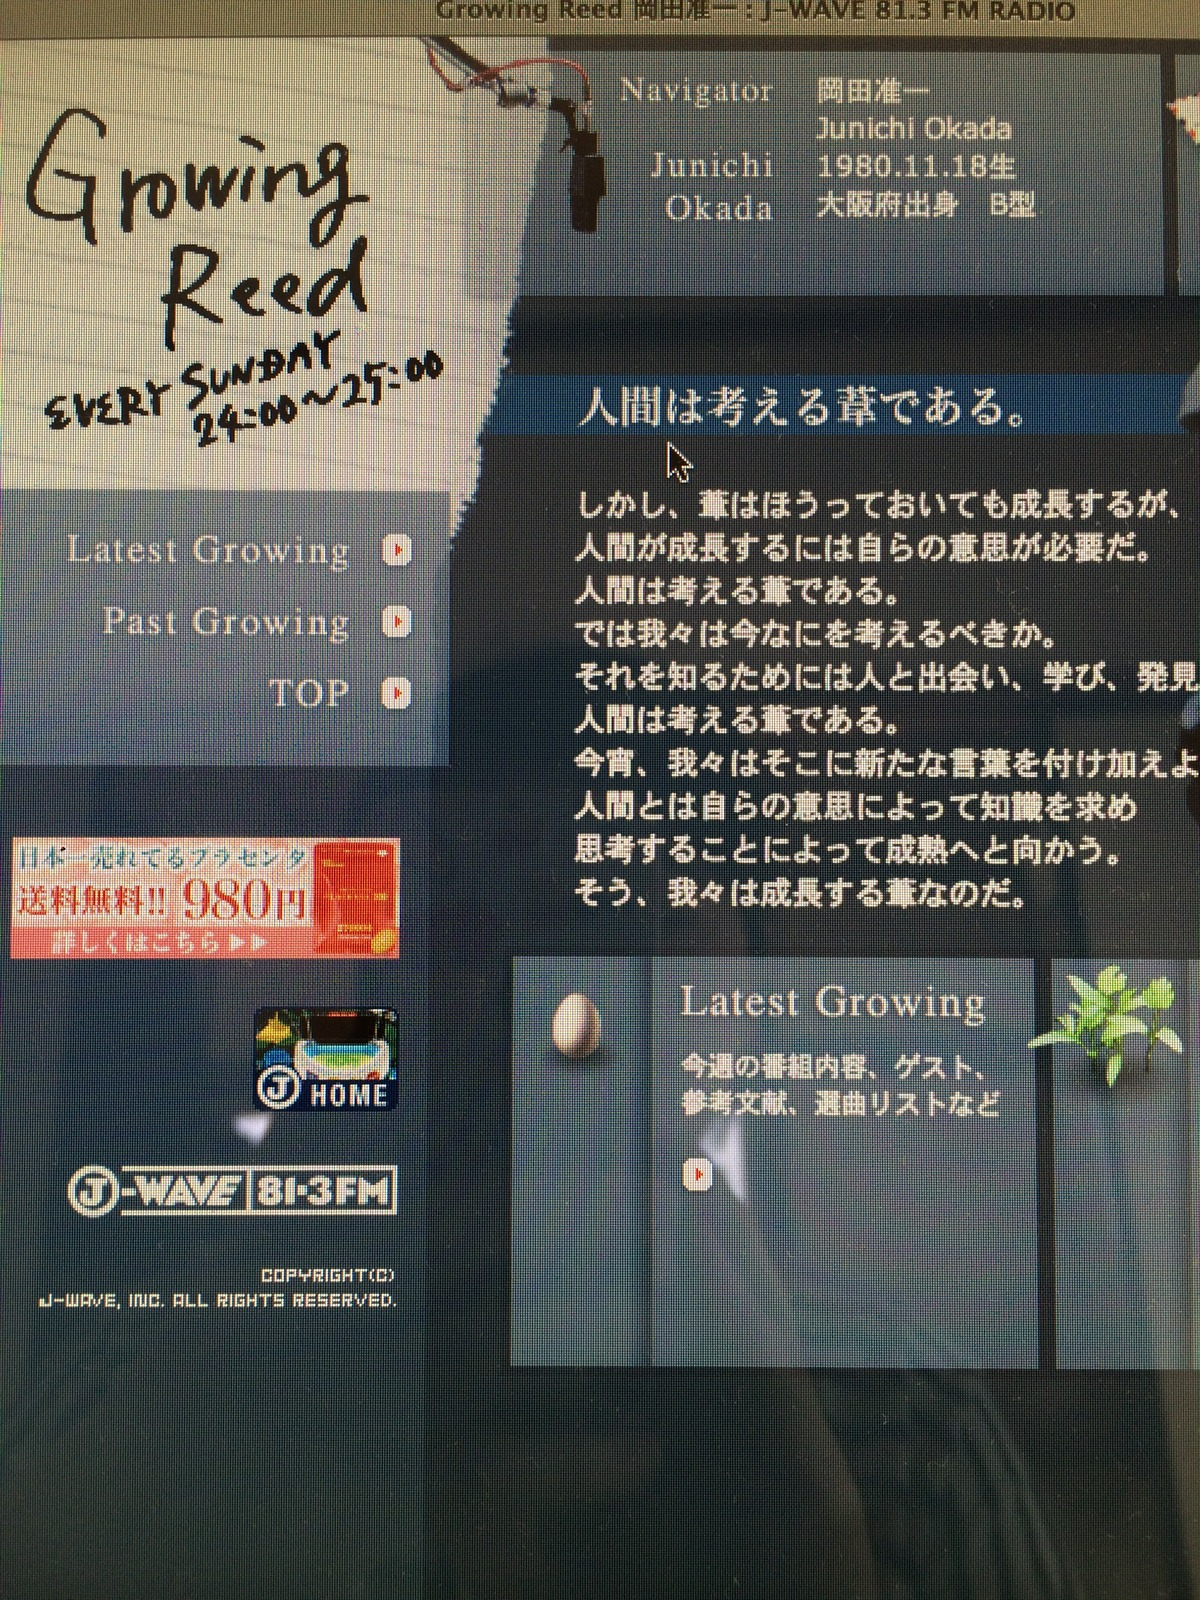 3/8(sun) 深夜24:00-25:00「GROWING REED」(ナビゲーター:岡田准一)に出演します。